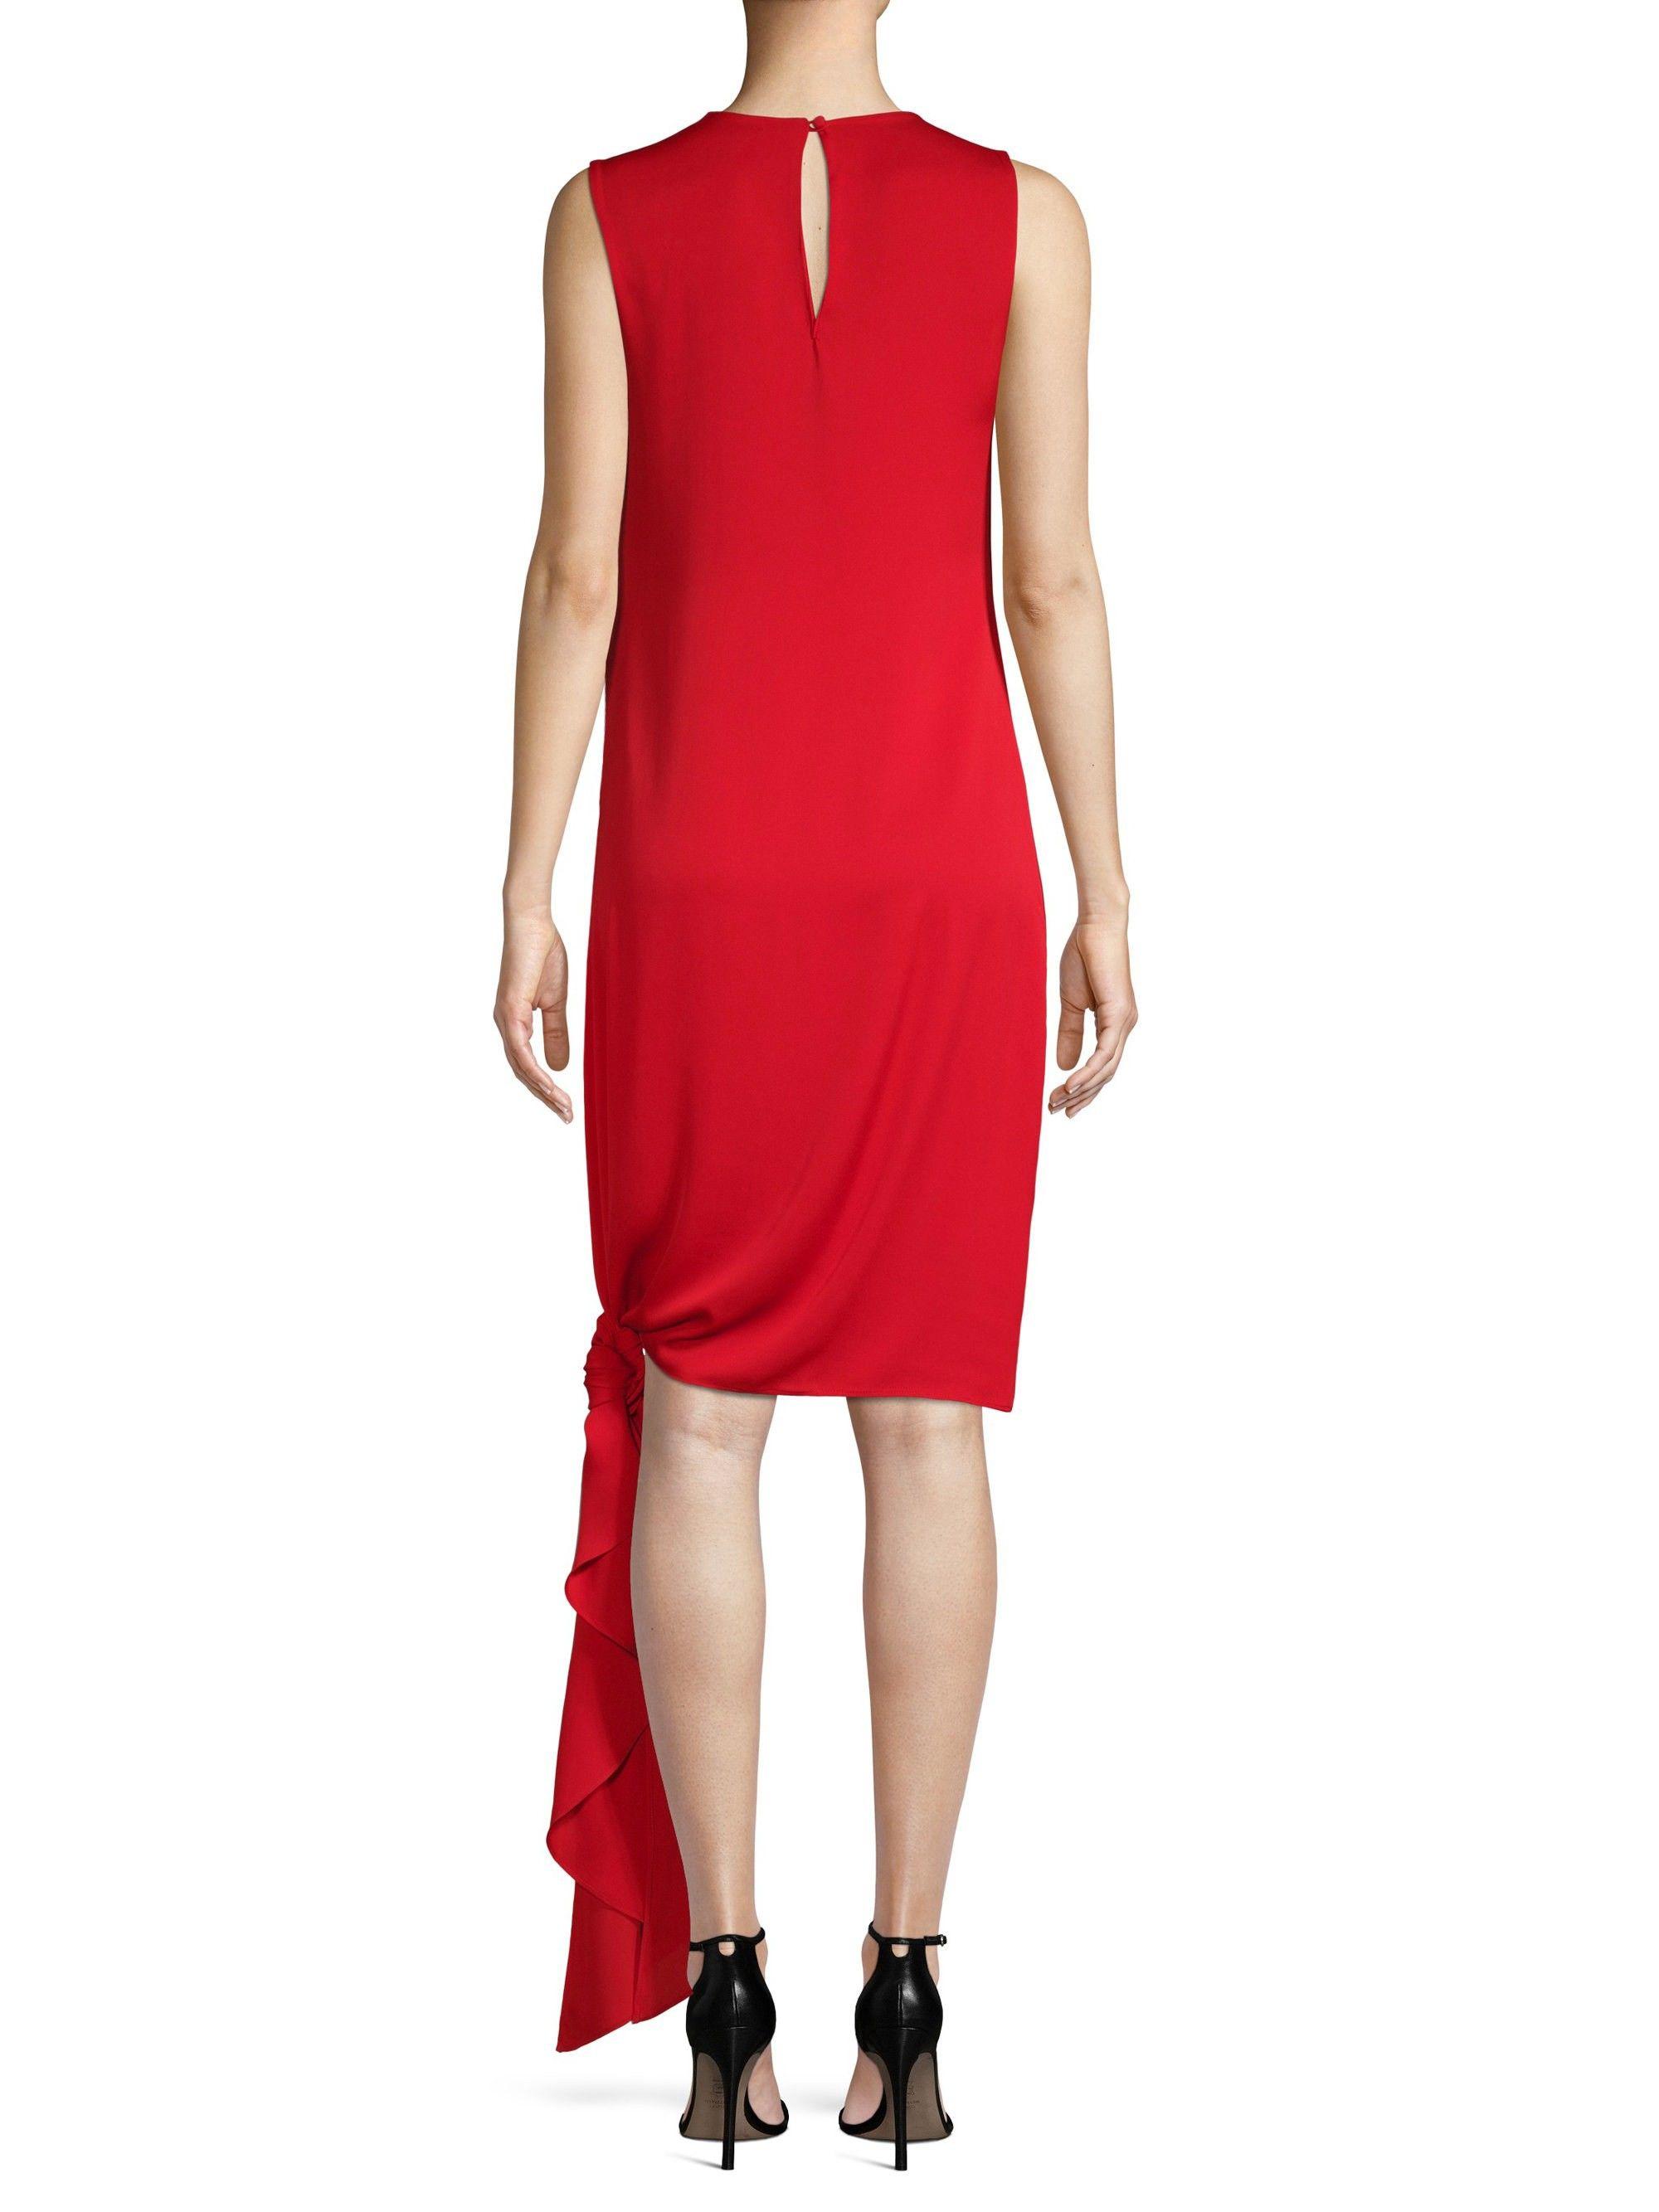 21a39a90 Stretch Silk Chiara Shift Dress by Milly | Products | Dresses, Silk ...